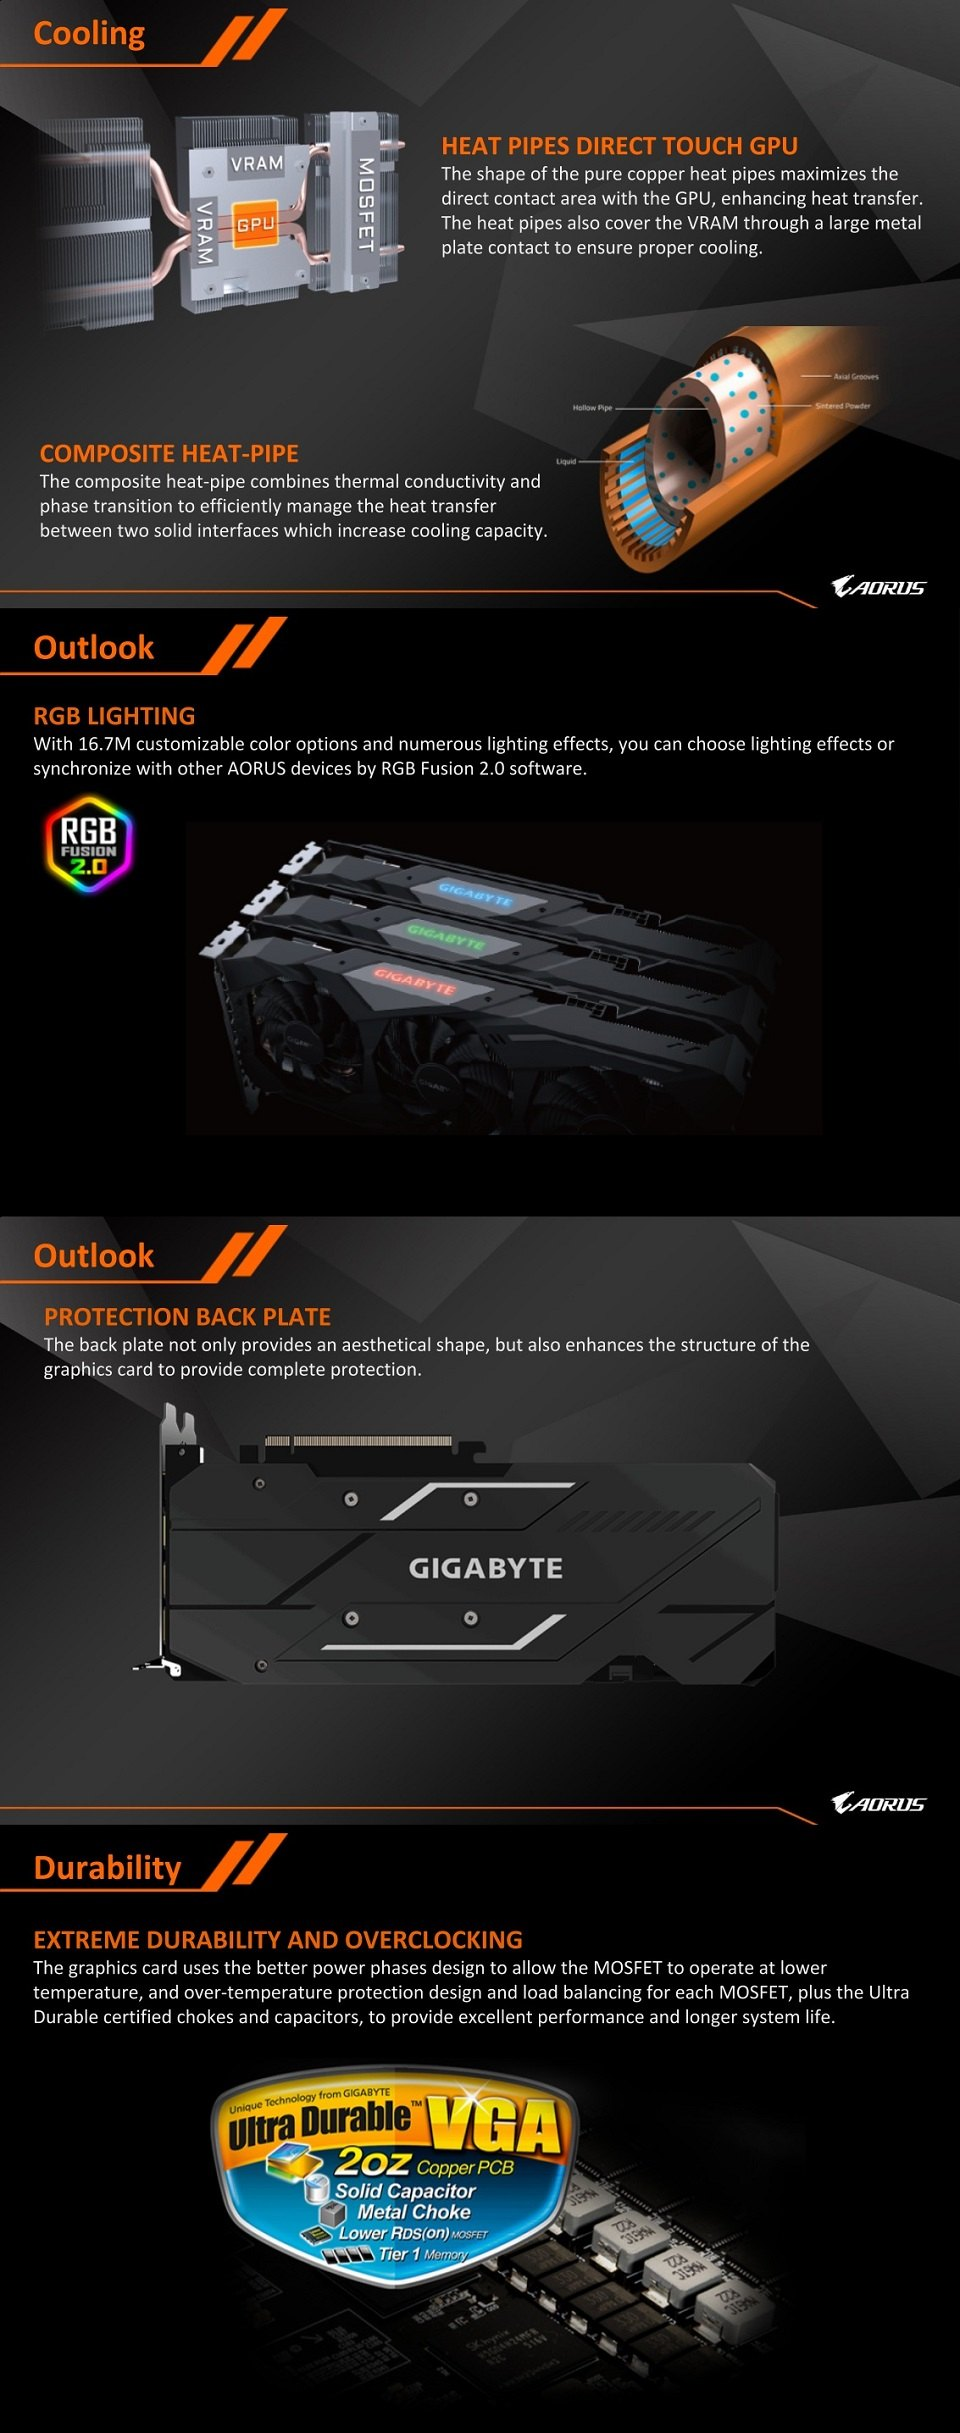 Gigabyte Radeon RX 5500 XT Gaming OC 4GB features 2